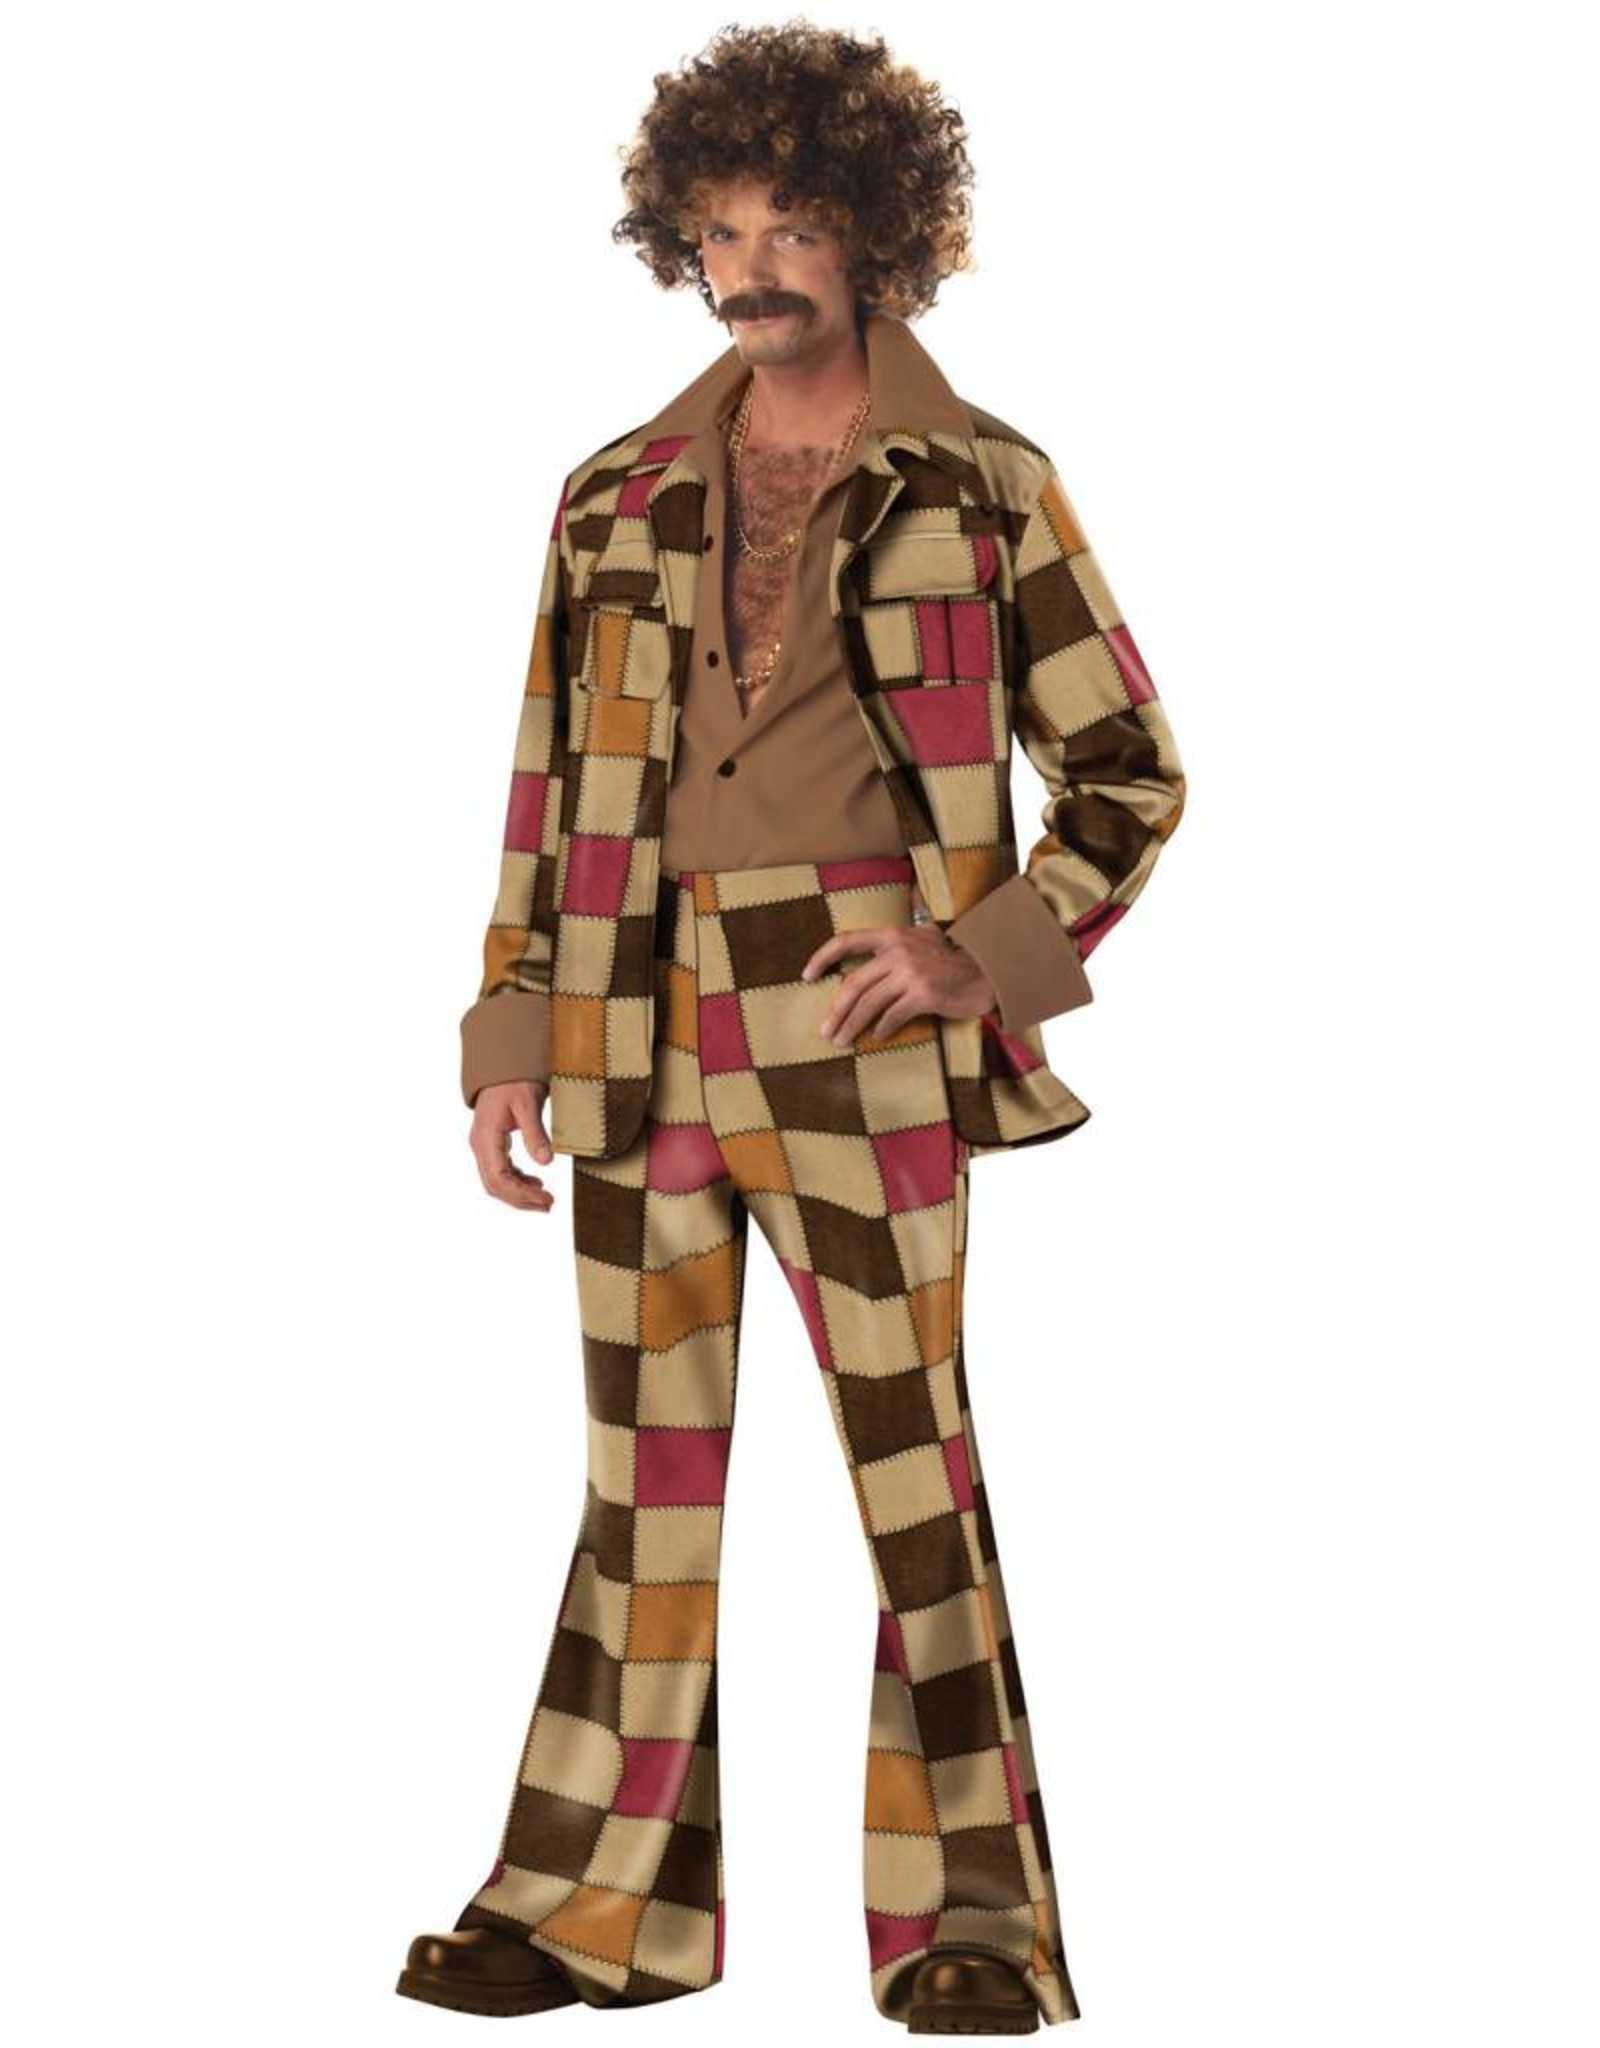 California Costume Disco Sleazeball